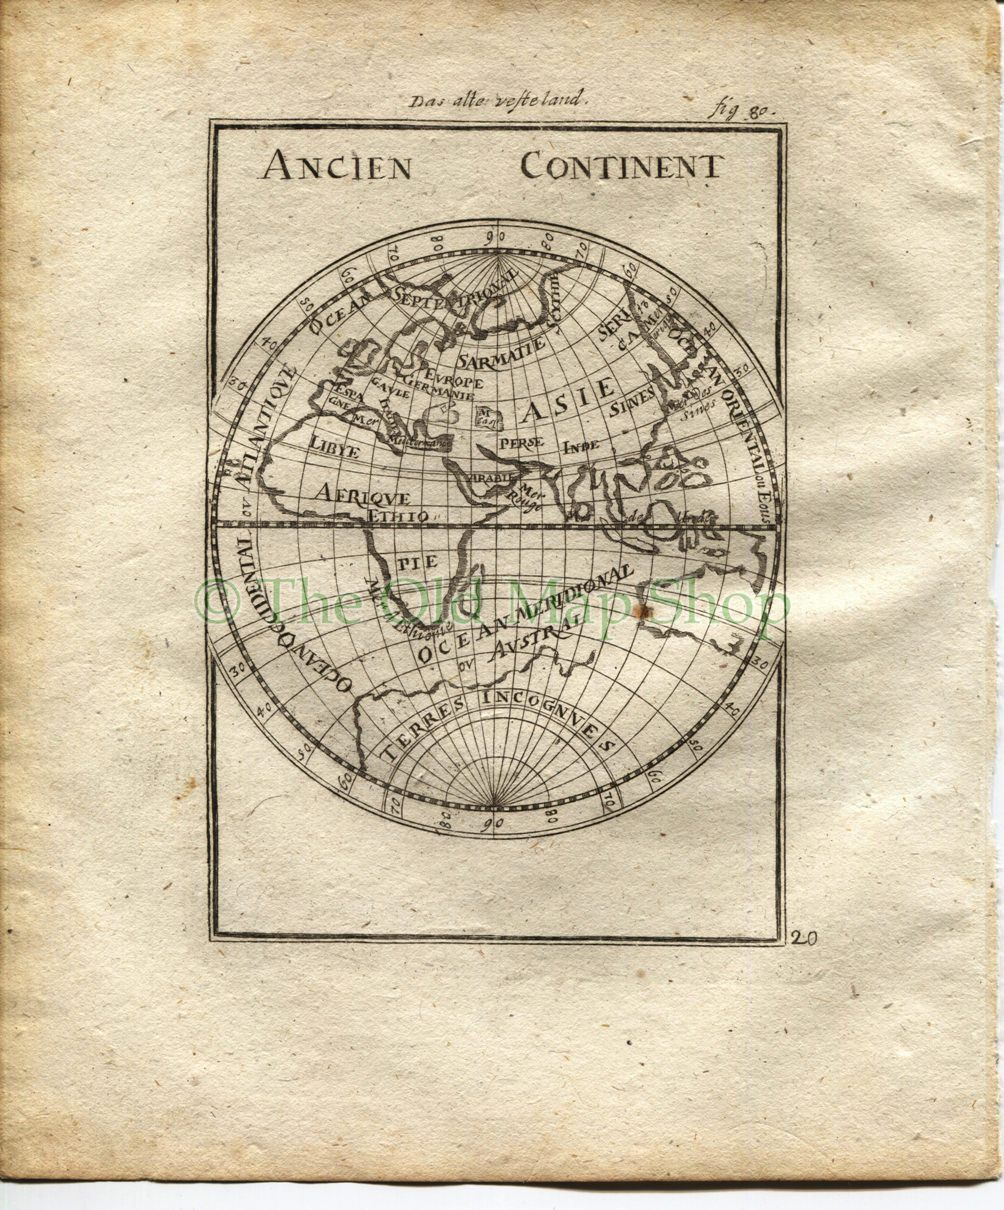 Map Netherlands 1719 Manesson Mallet France; Pais-Bas Pays-Bas Antique Print published by Johann Adam Jung